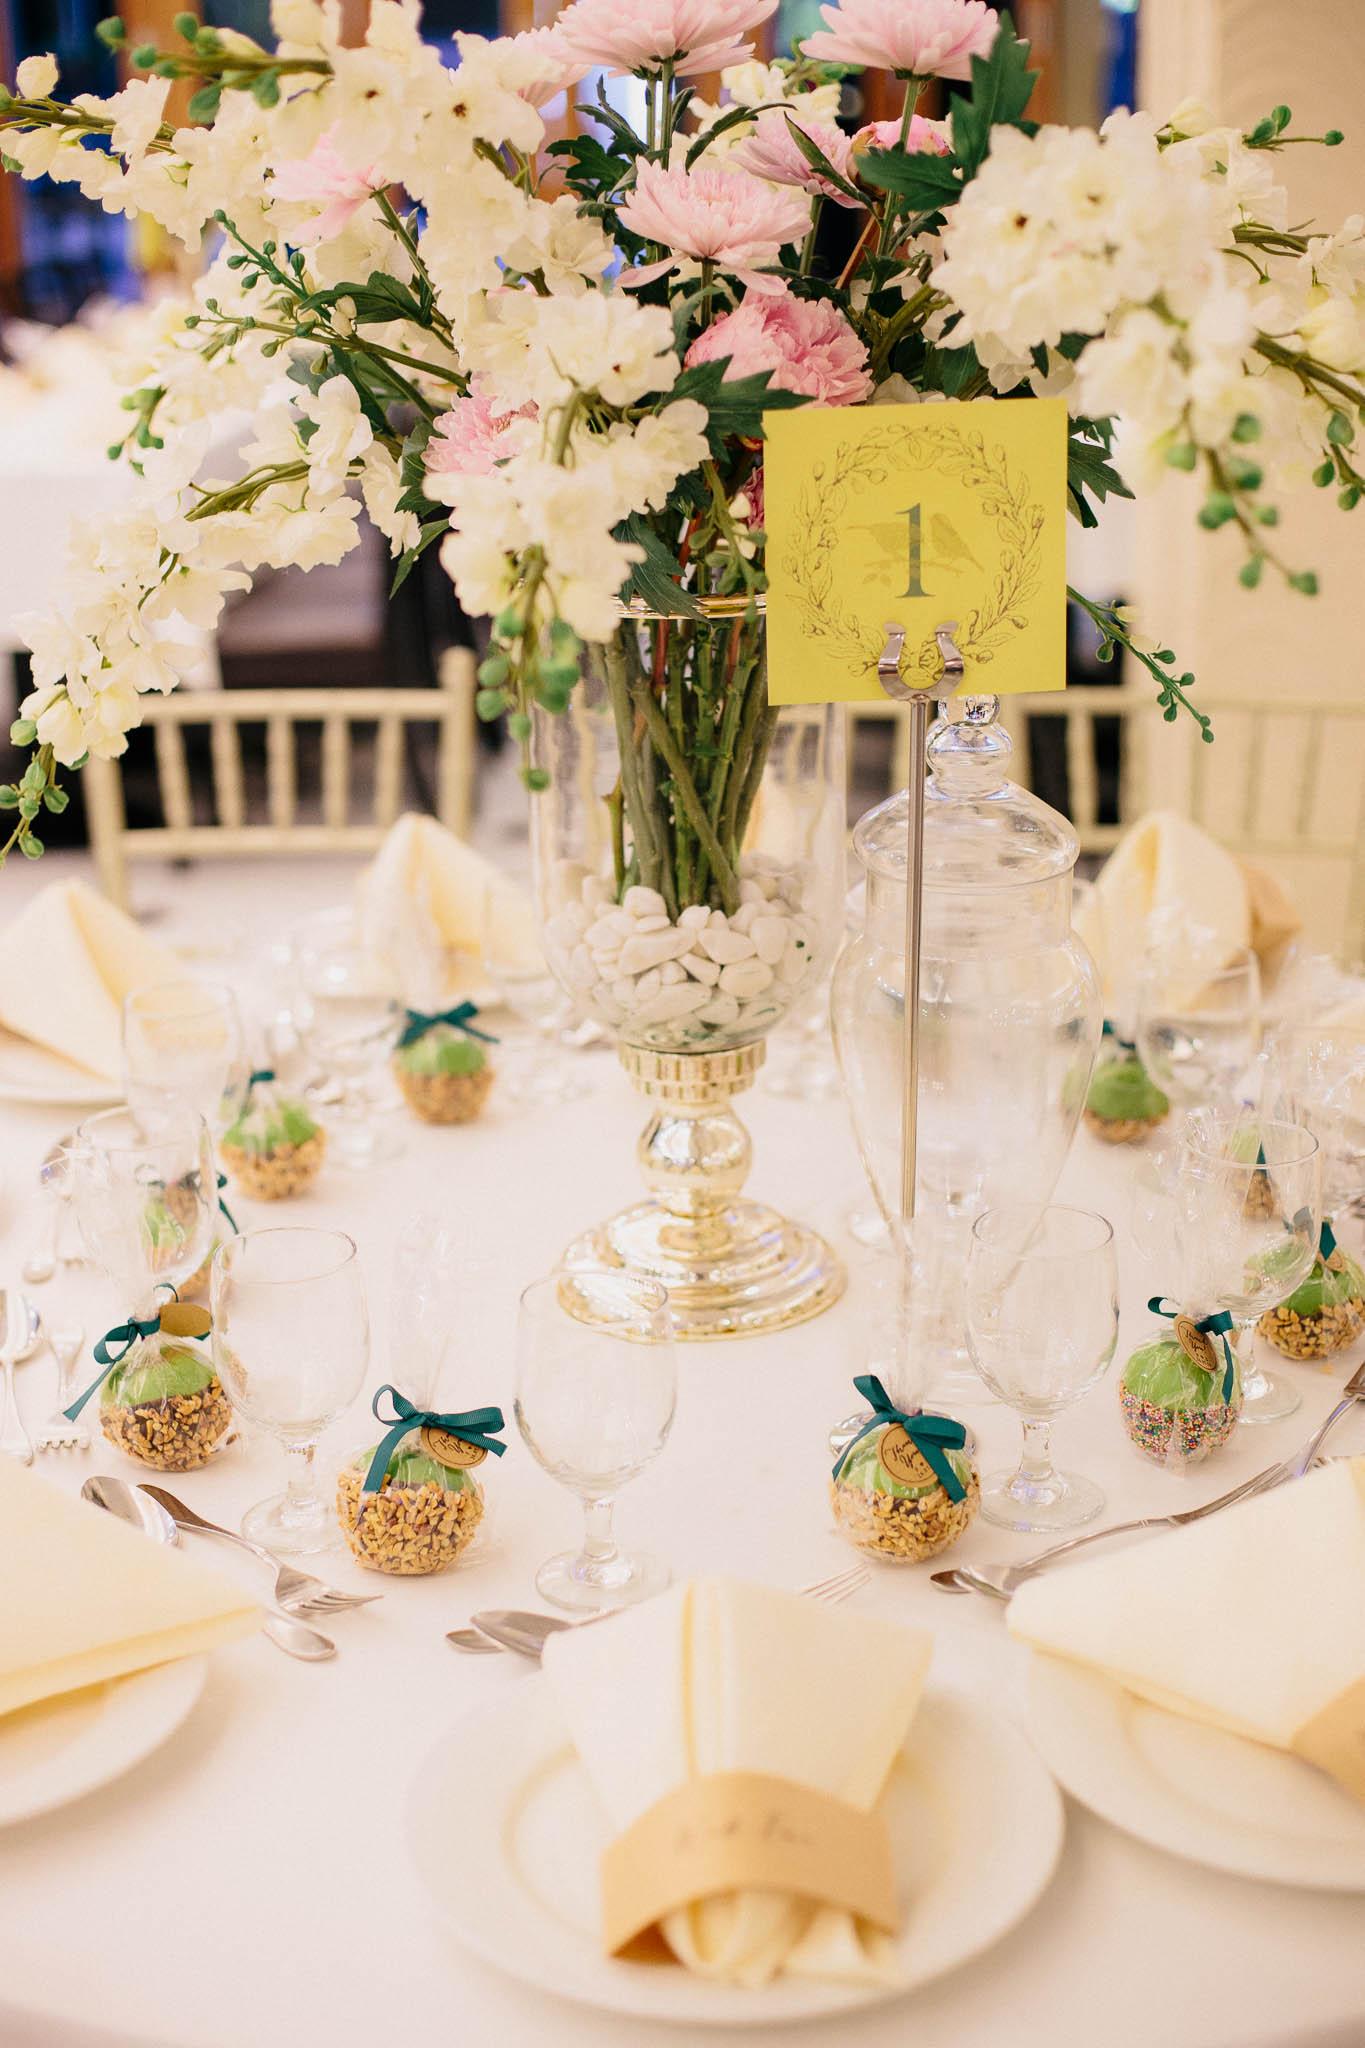 singapore-wedding-photographer-malay-indian-pre-wedding-travel-wmt-2015-shereen-farid-51.jpg